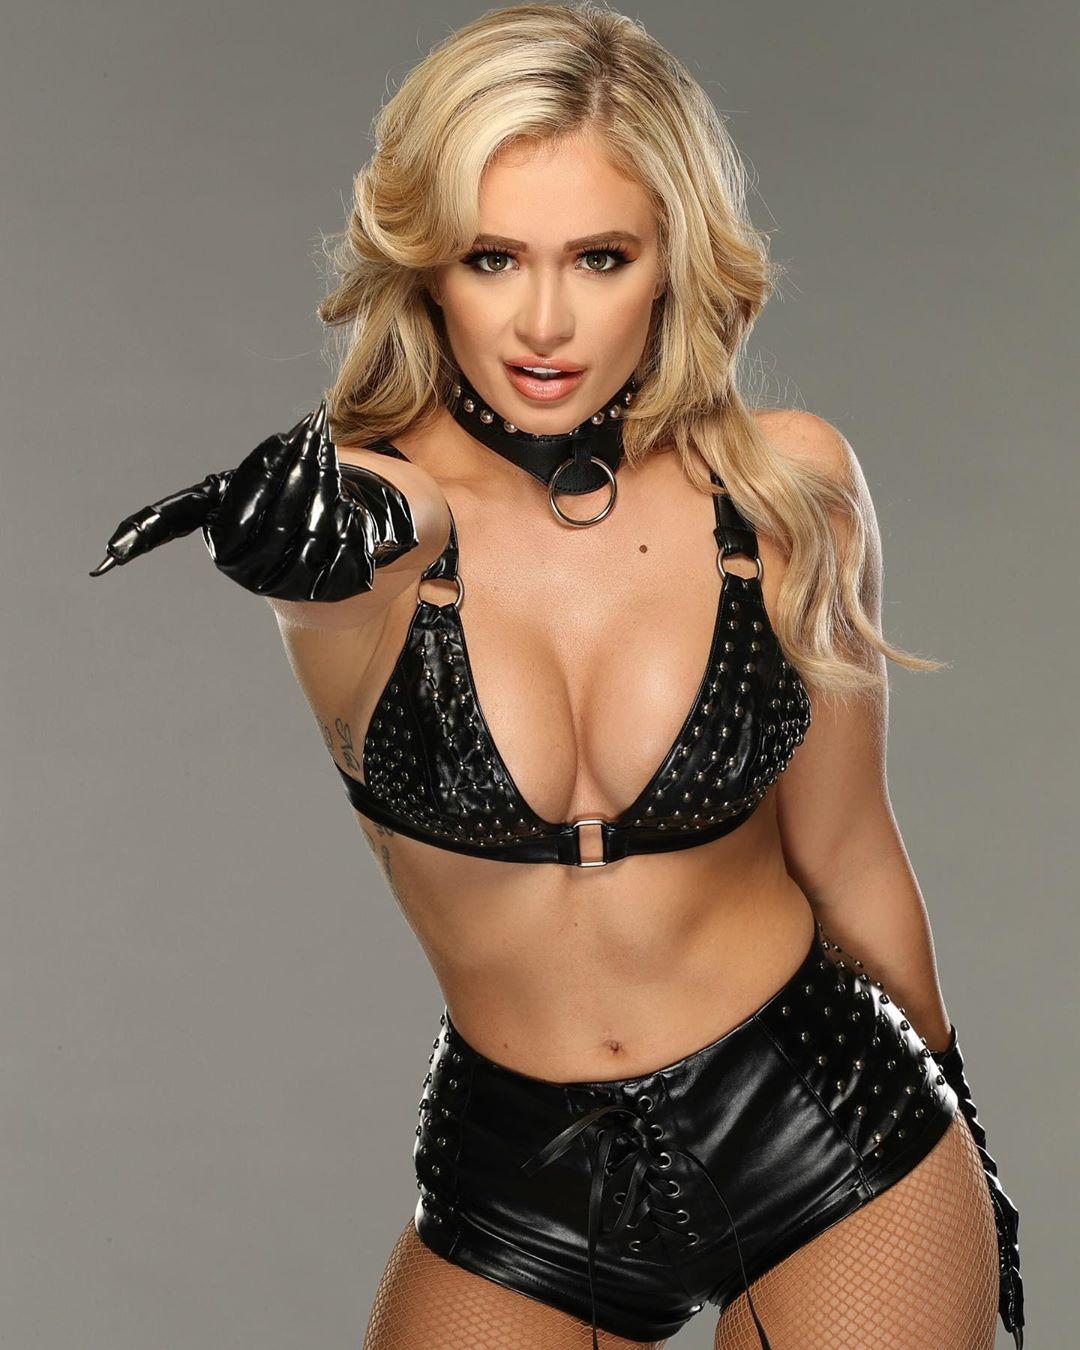 Bombshell Scarlett Reportedly Considered For WWE Main Roster Debut 157